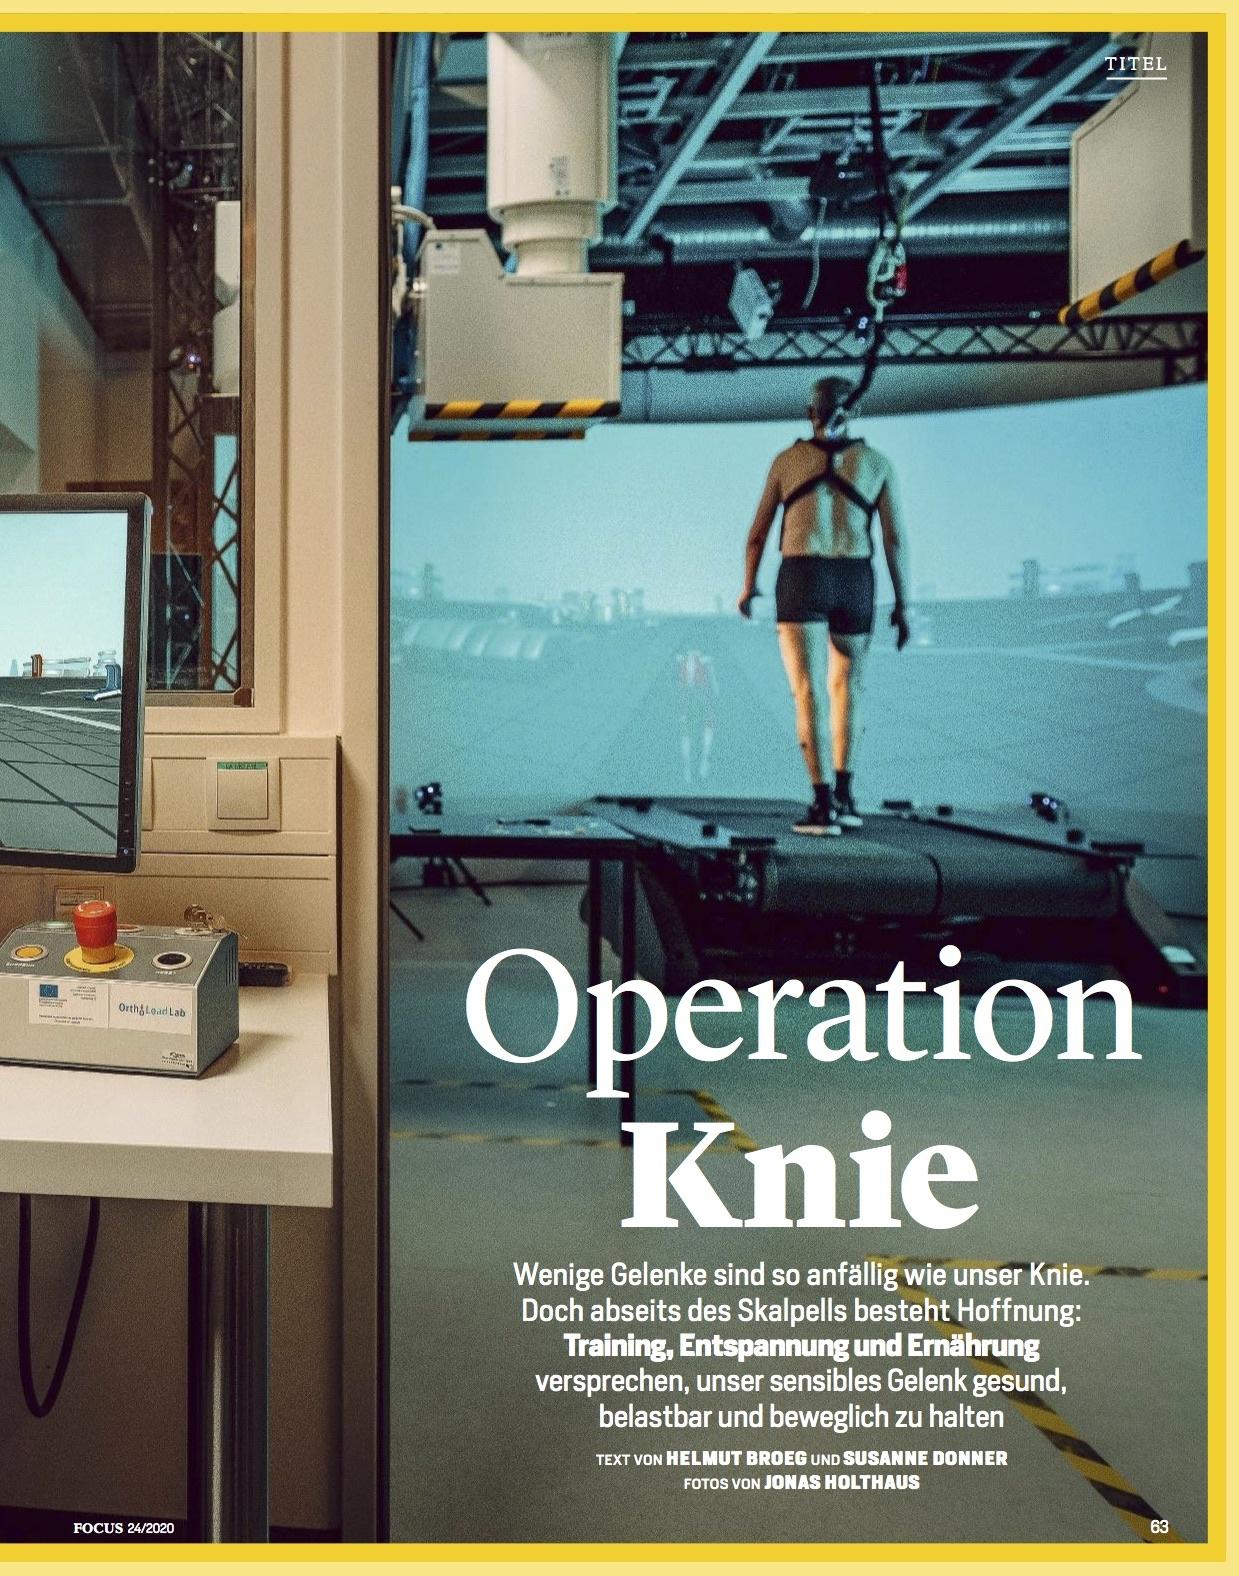 FOCUS Magazin FOCUS Magazin - Patient Knie